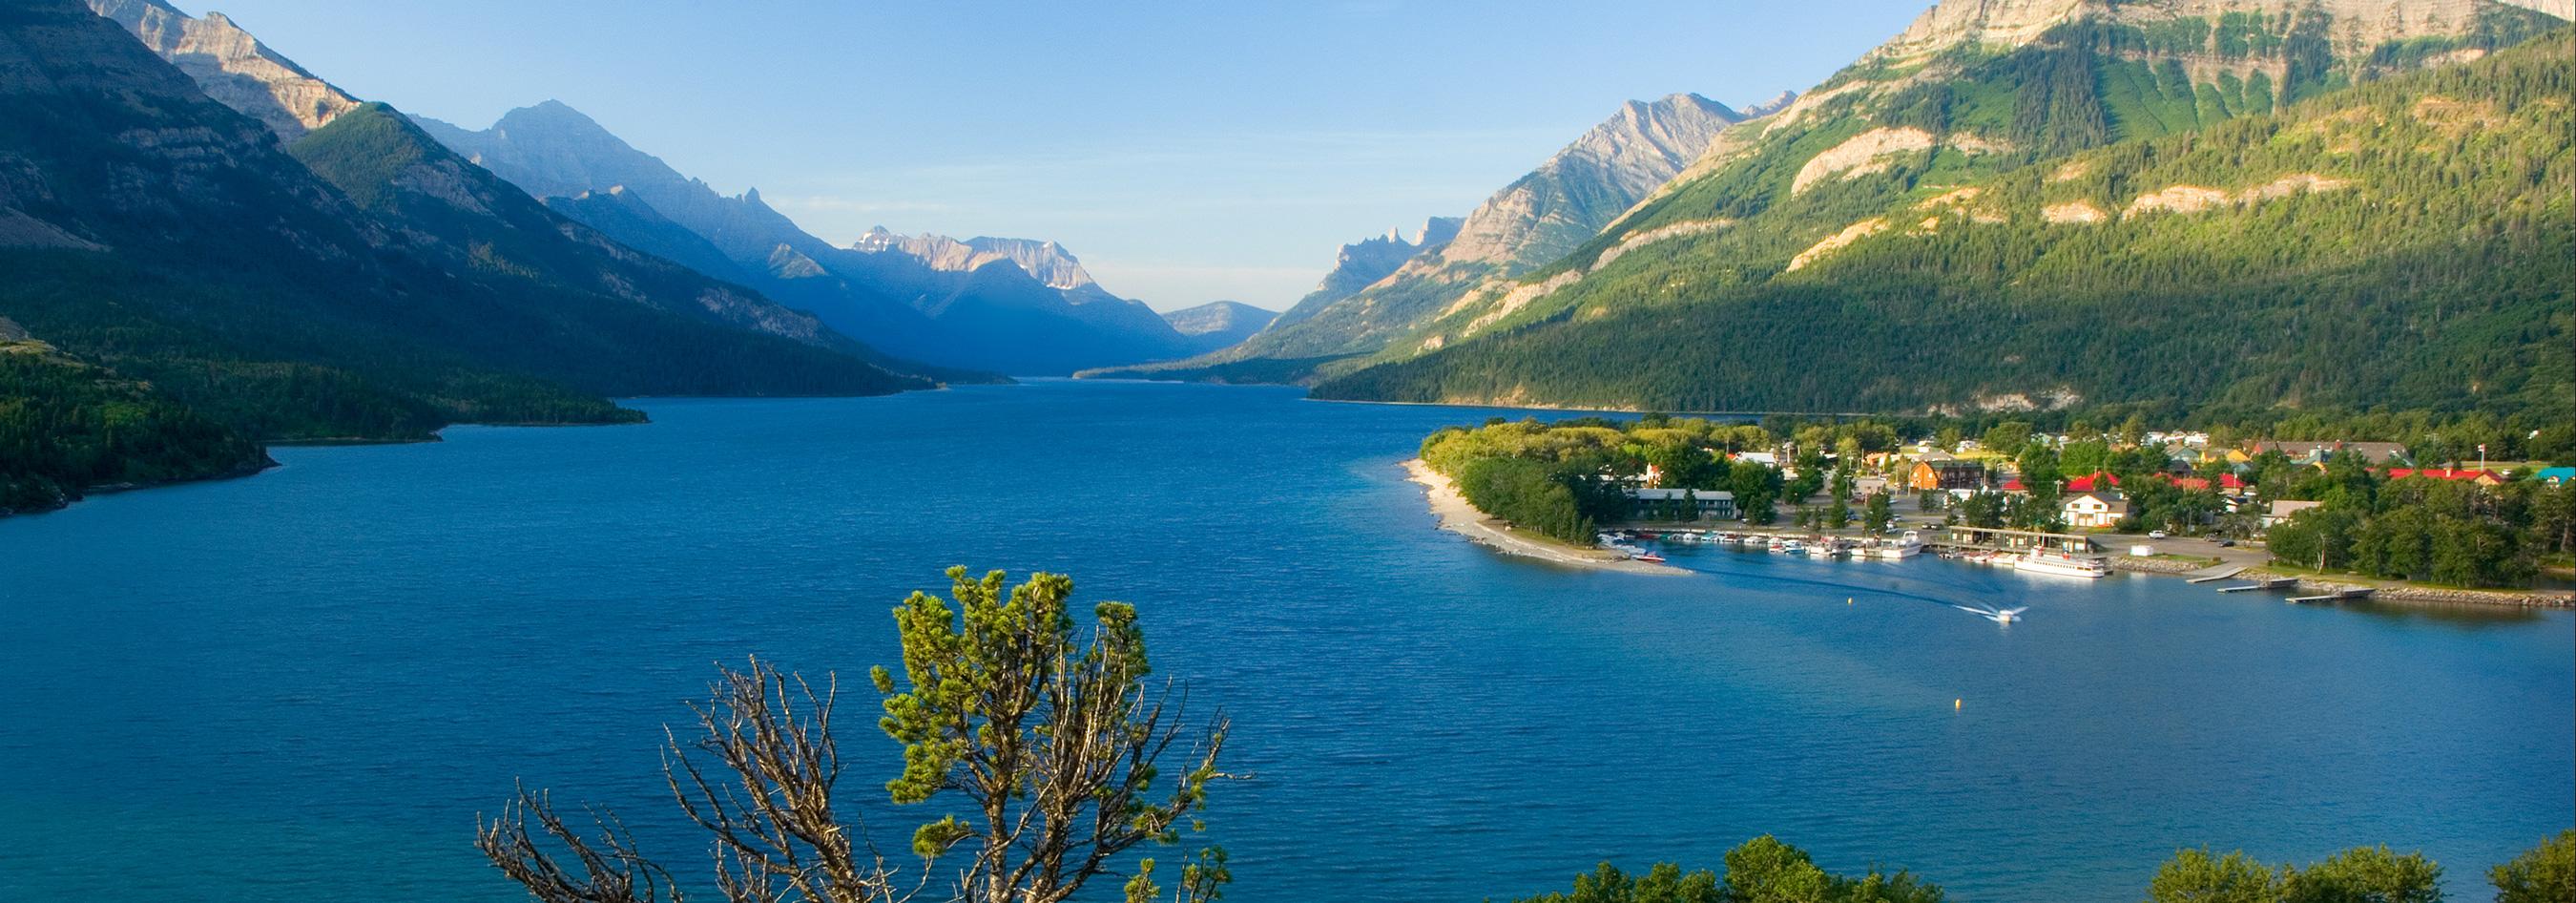 Hotels In Waterton Alberta Canada